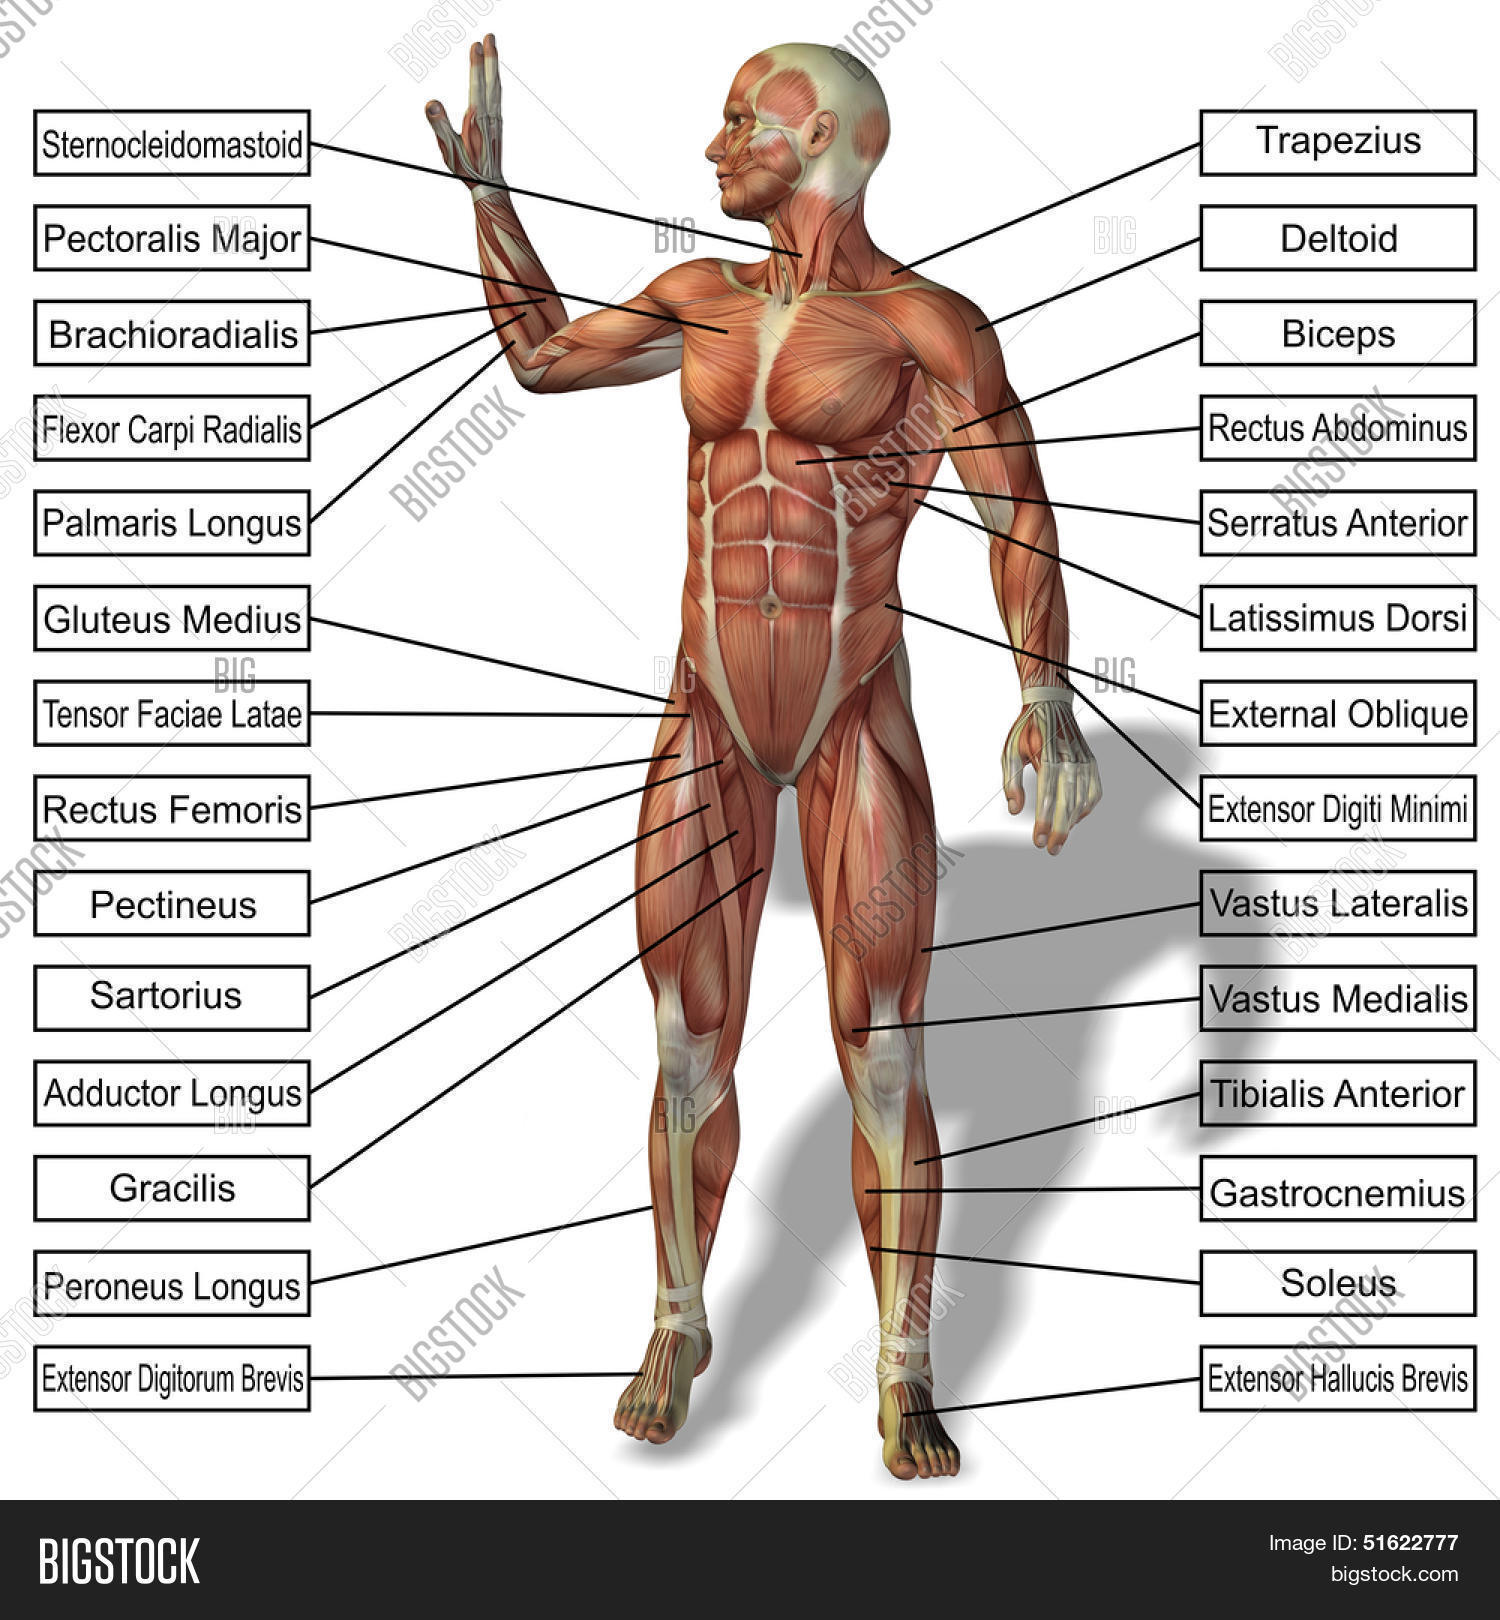 3d Male Human Anatomy Image Photo Free Trial Bigstock